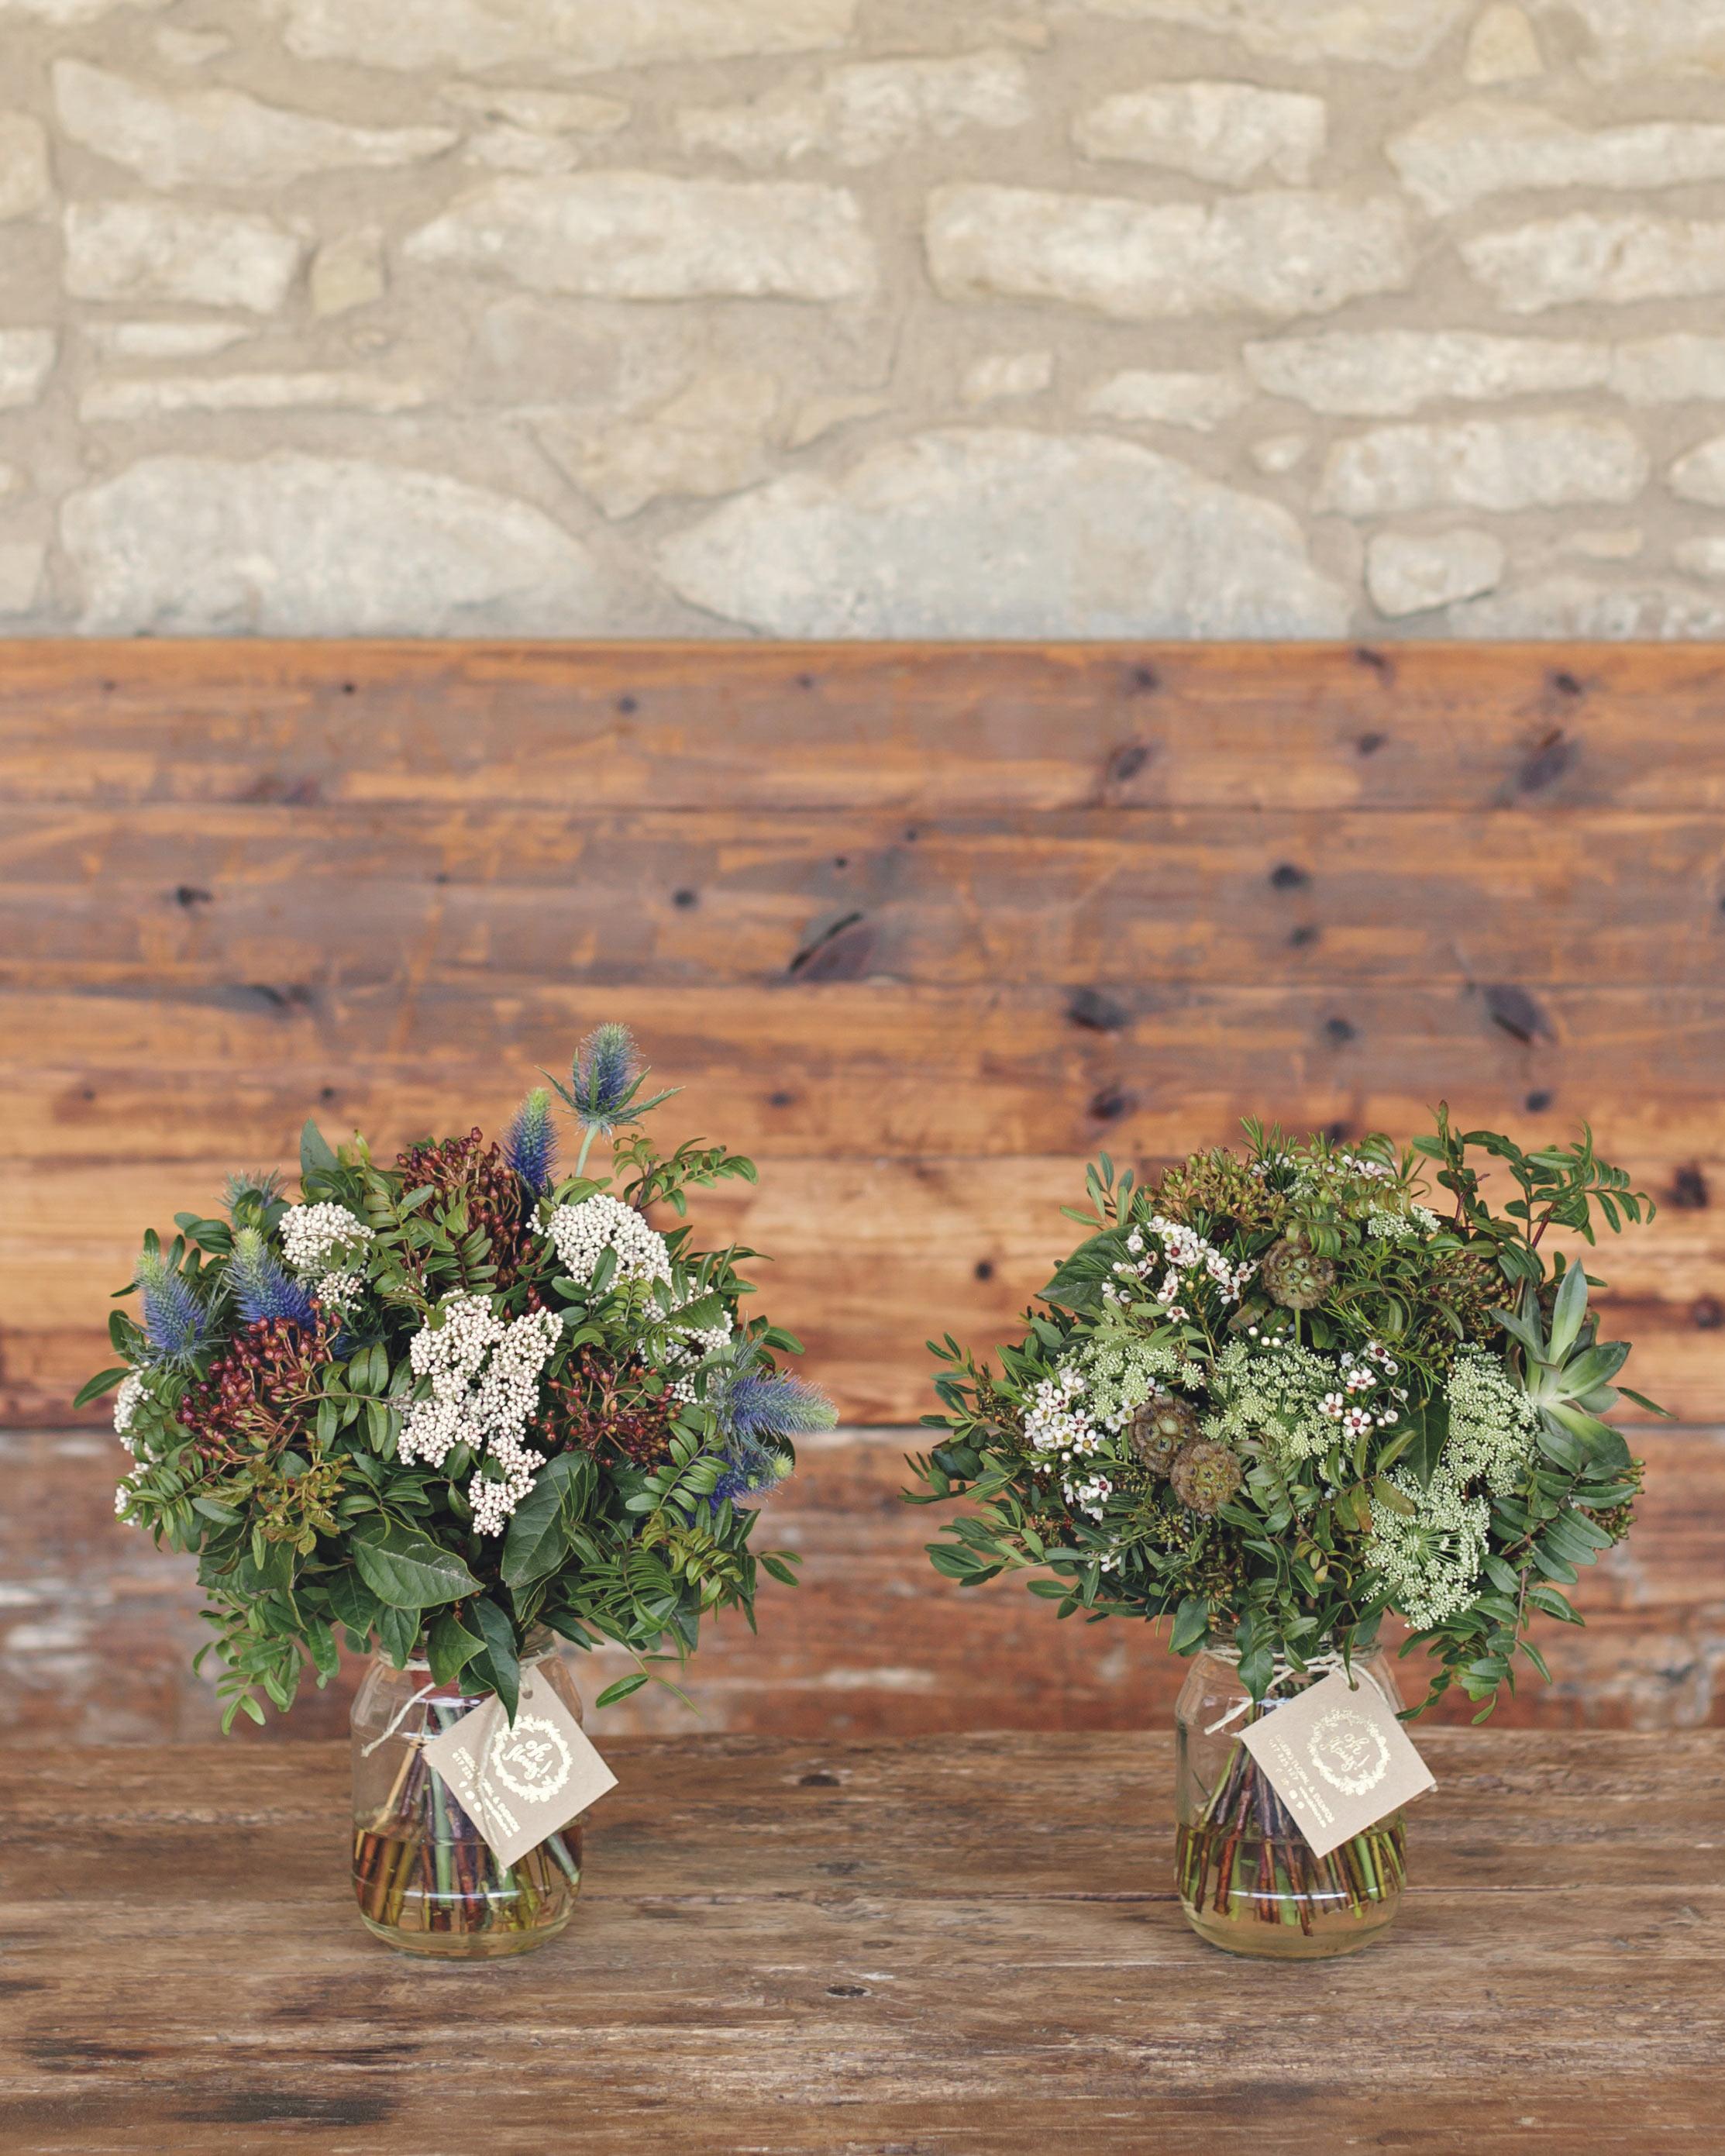 anna-ania-wedding-bouquets-025-s112510-0216.jpg